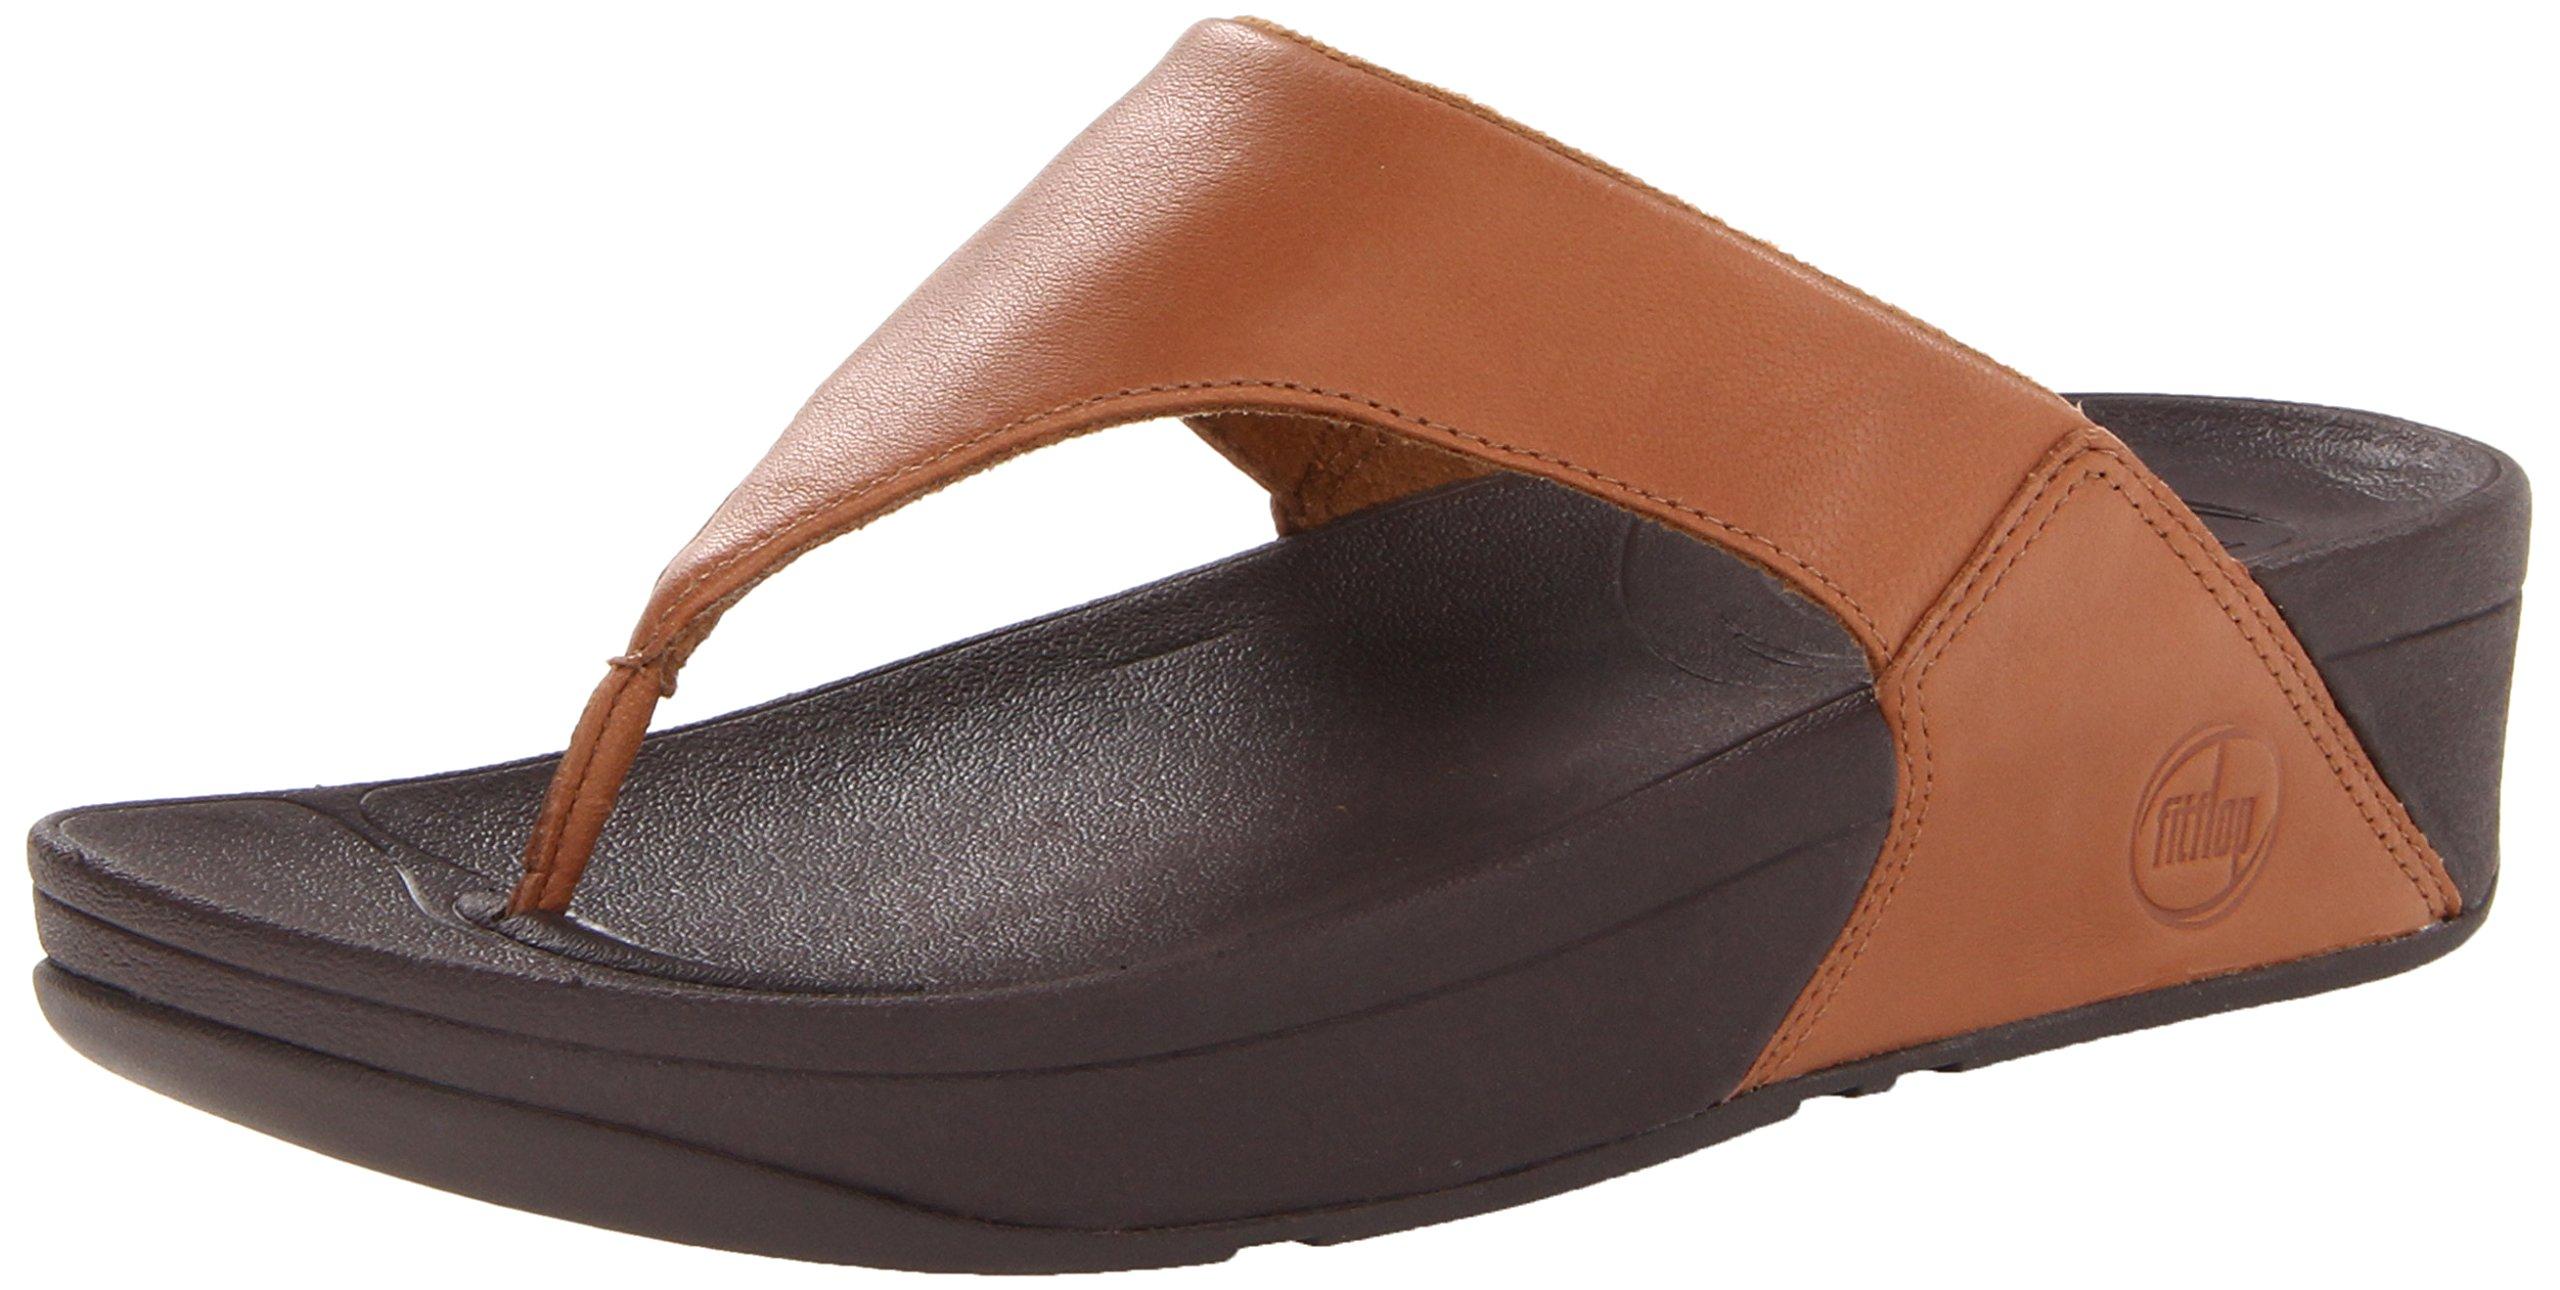 FitFlop Women's Lulu Thong Sandal,Toffee Tan,11 M US